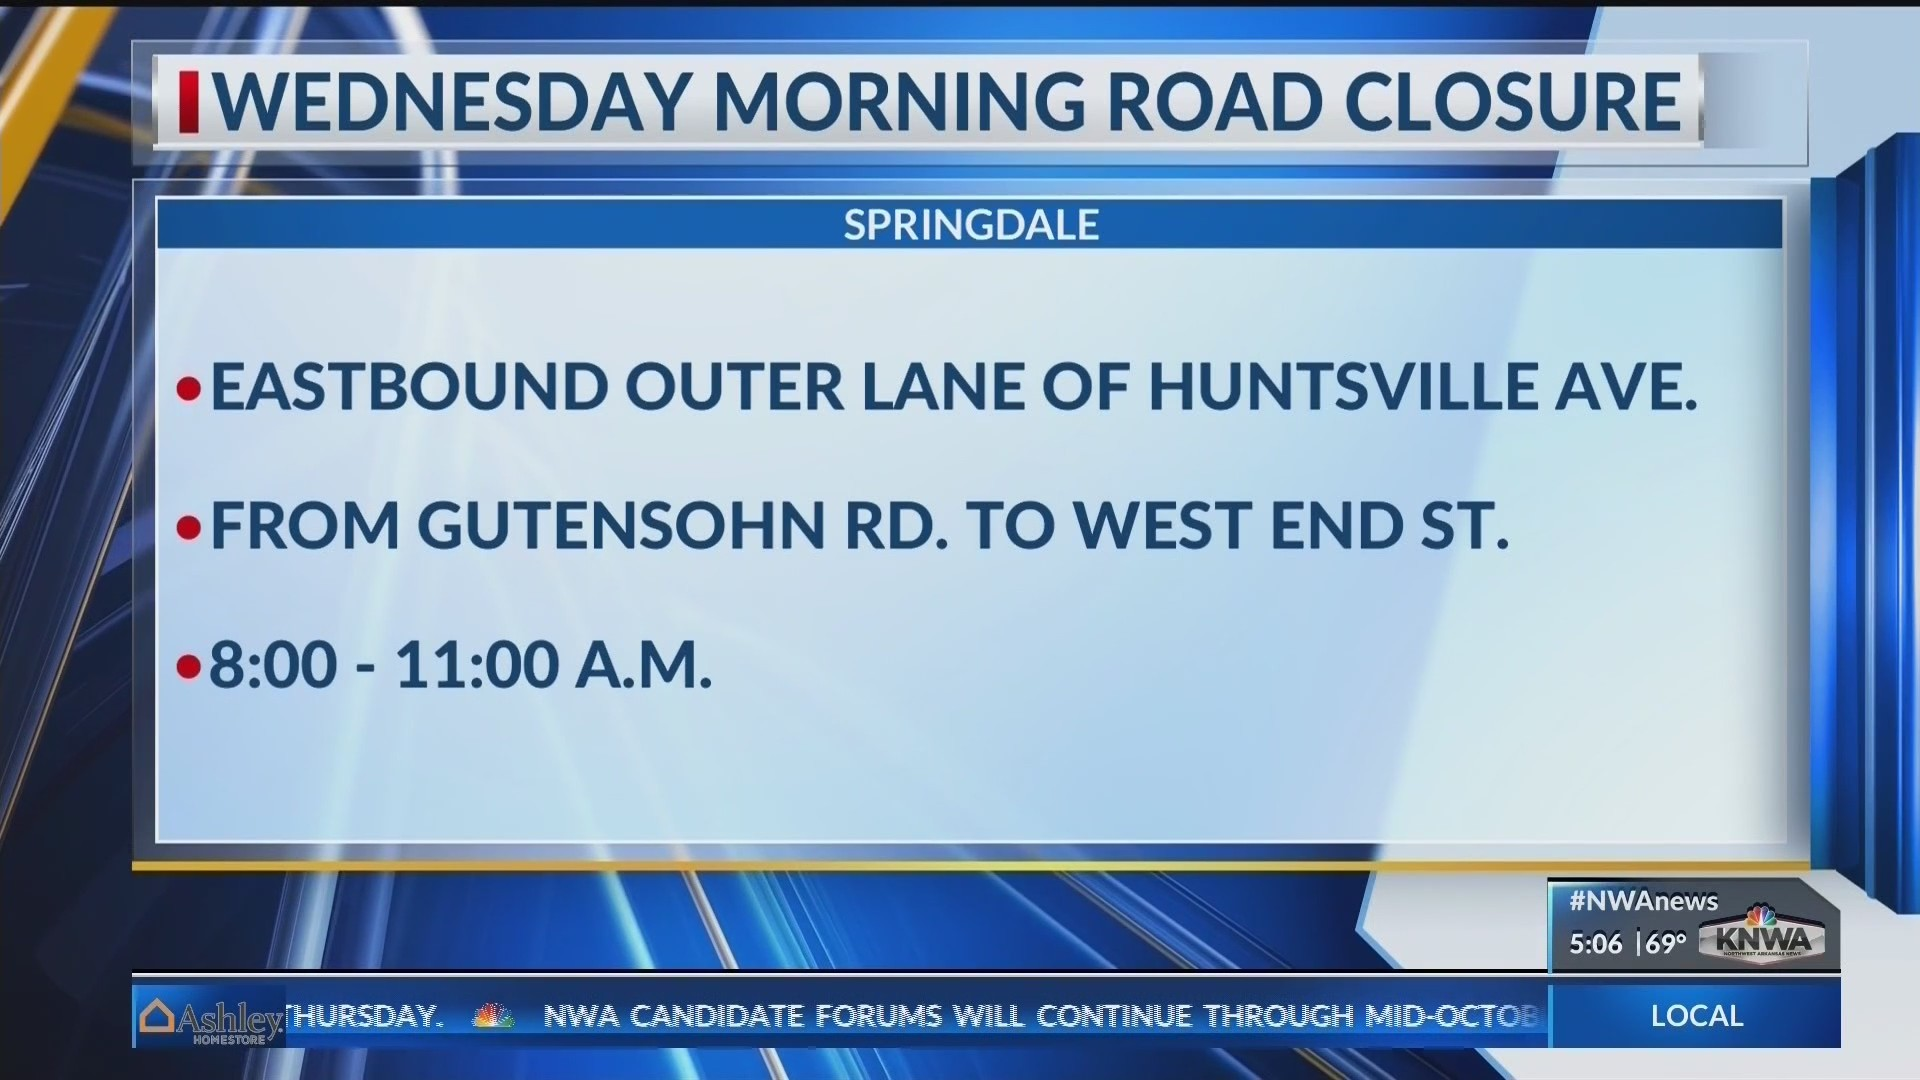 Road_Closure_Warning_in_Springdale_0_20180905113419